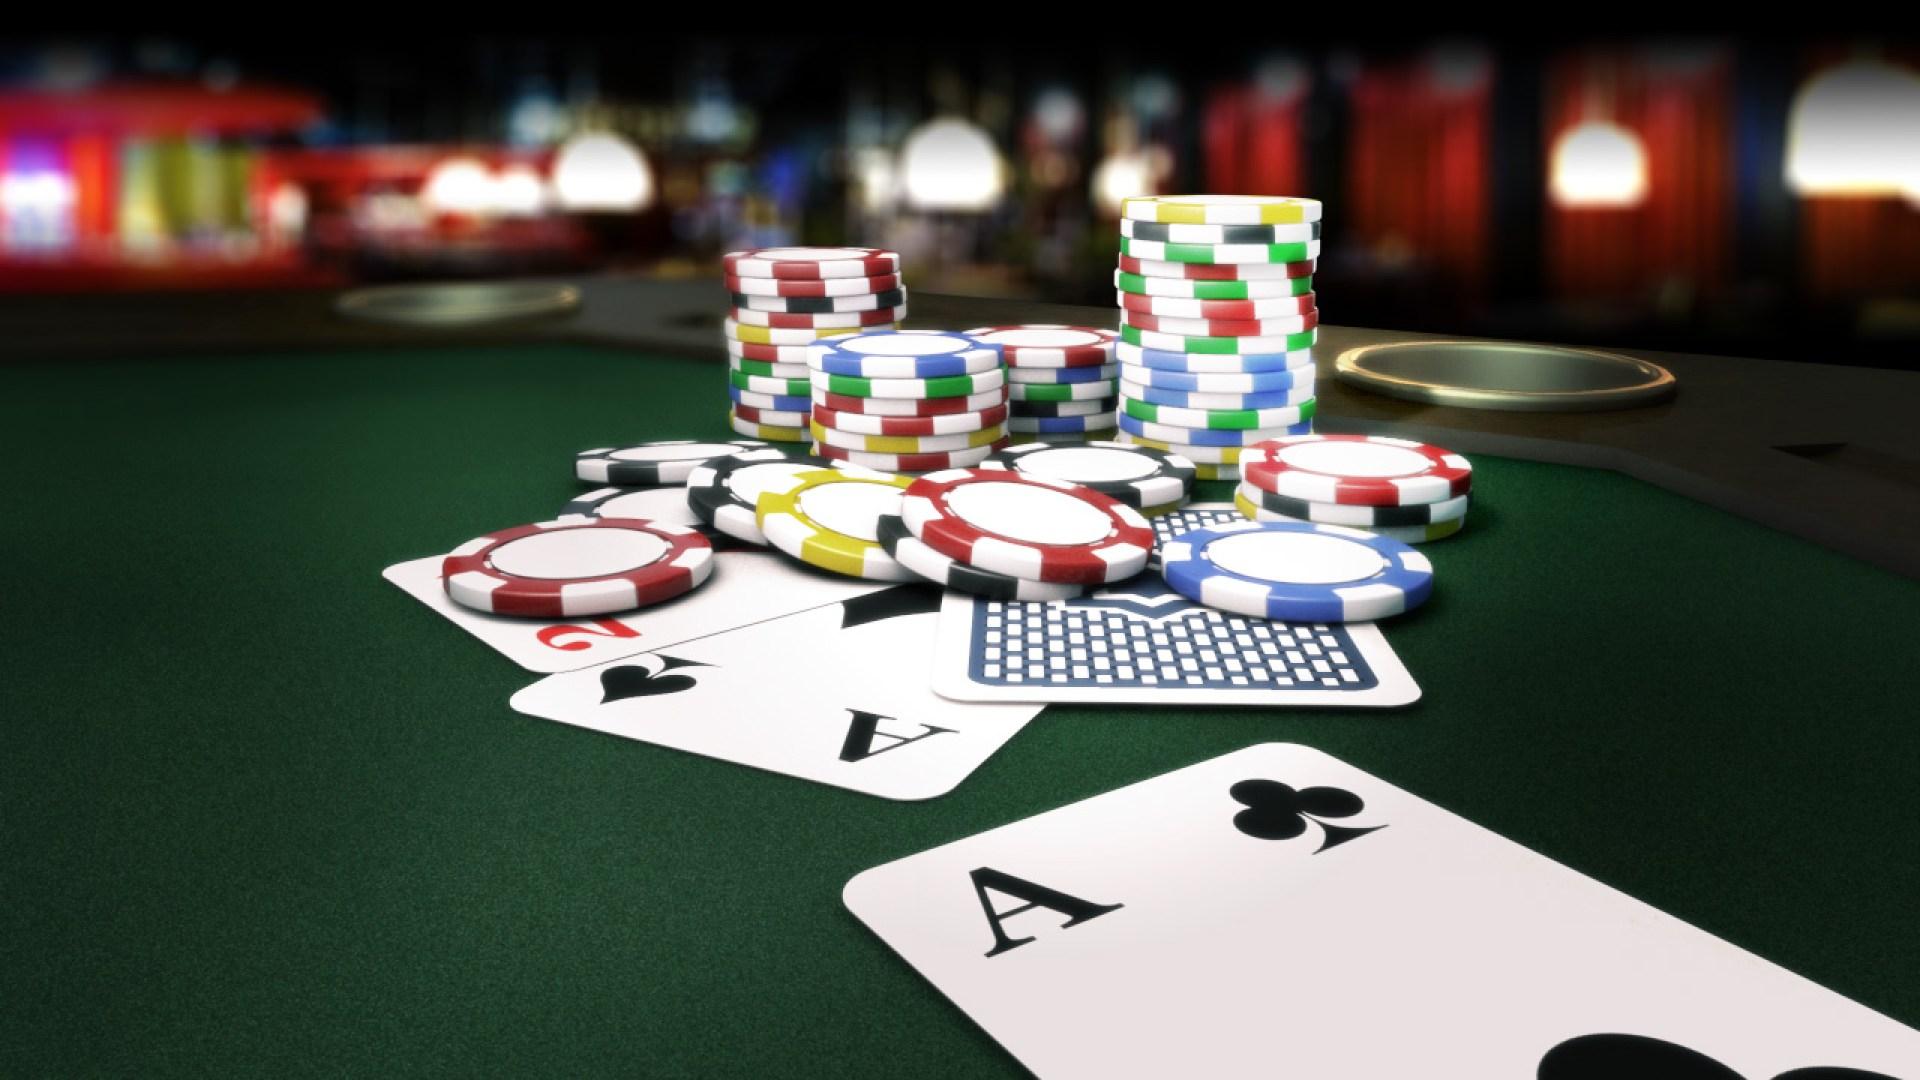 Bandar Judi Online offers the new spheres gambling online